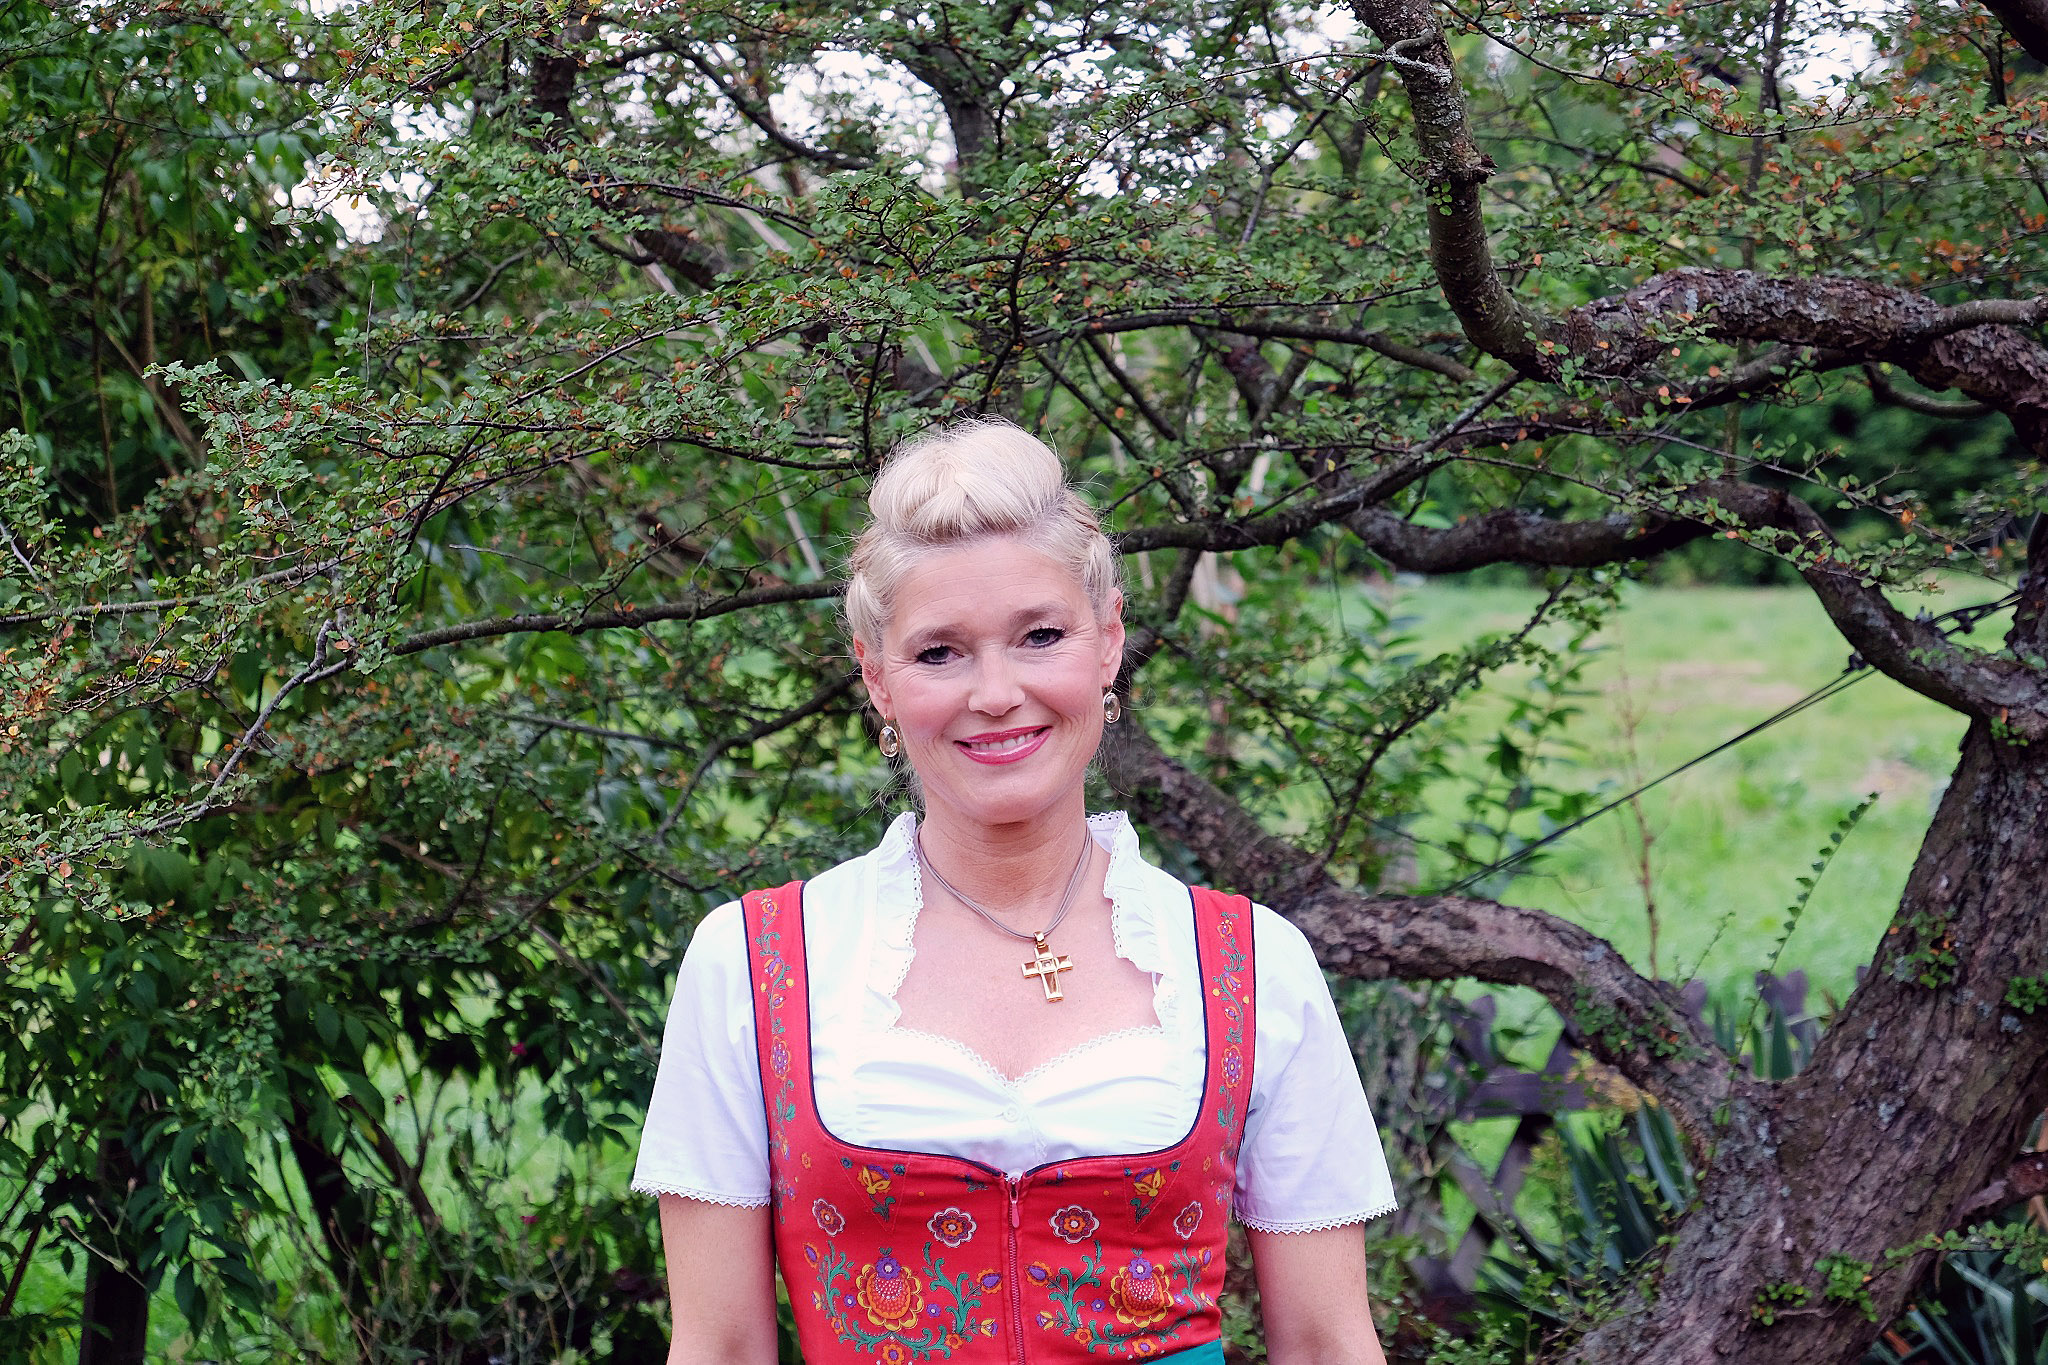 dirndl-look-dirndl-outfit-modeblog-fashionblog-oktoberfest-sauerland-wiesen-looklieblingsstil1